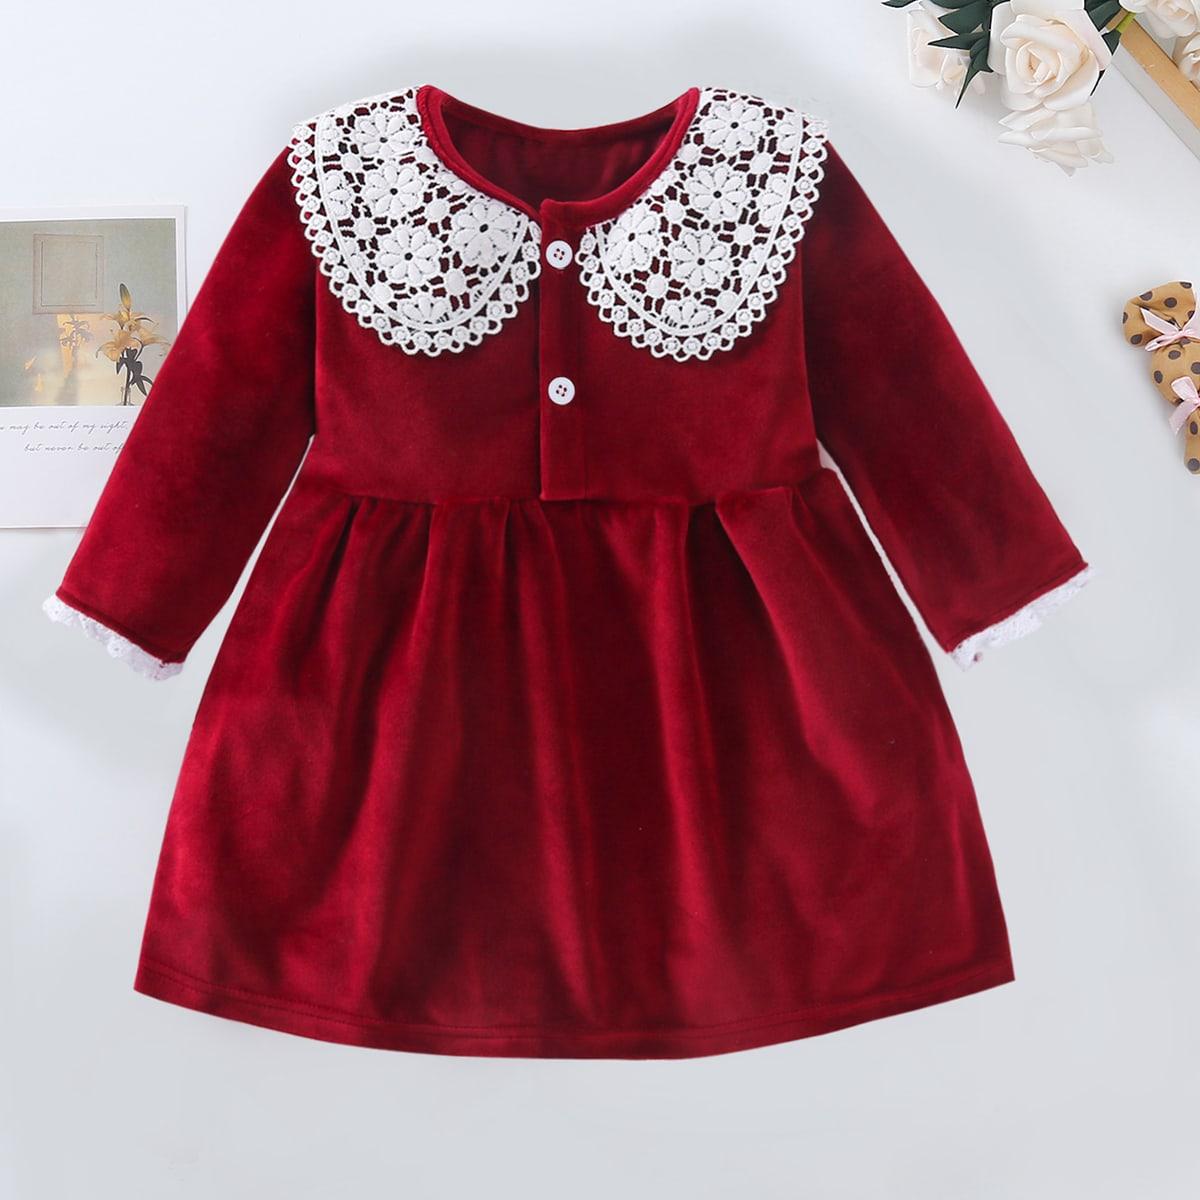 shein Betoverend Kleurblok Baby-jurk Knoop